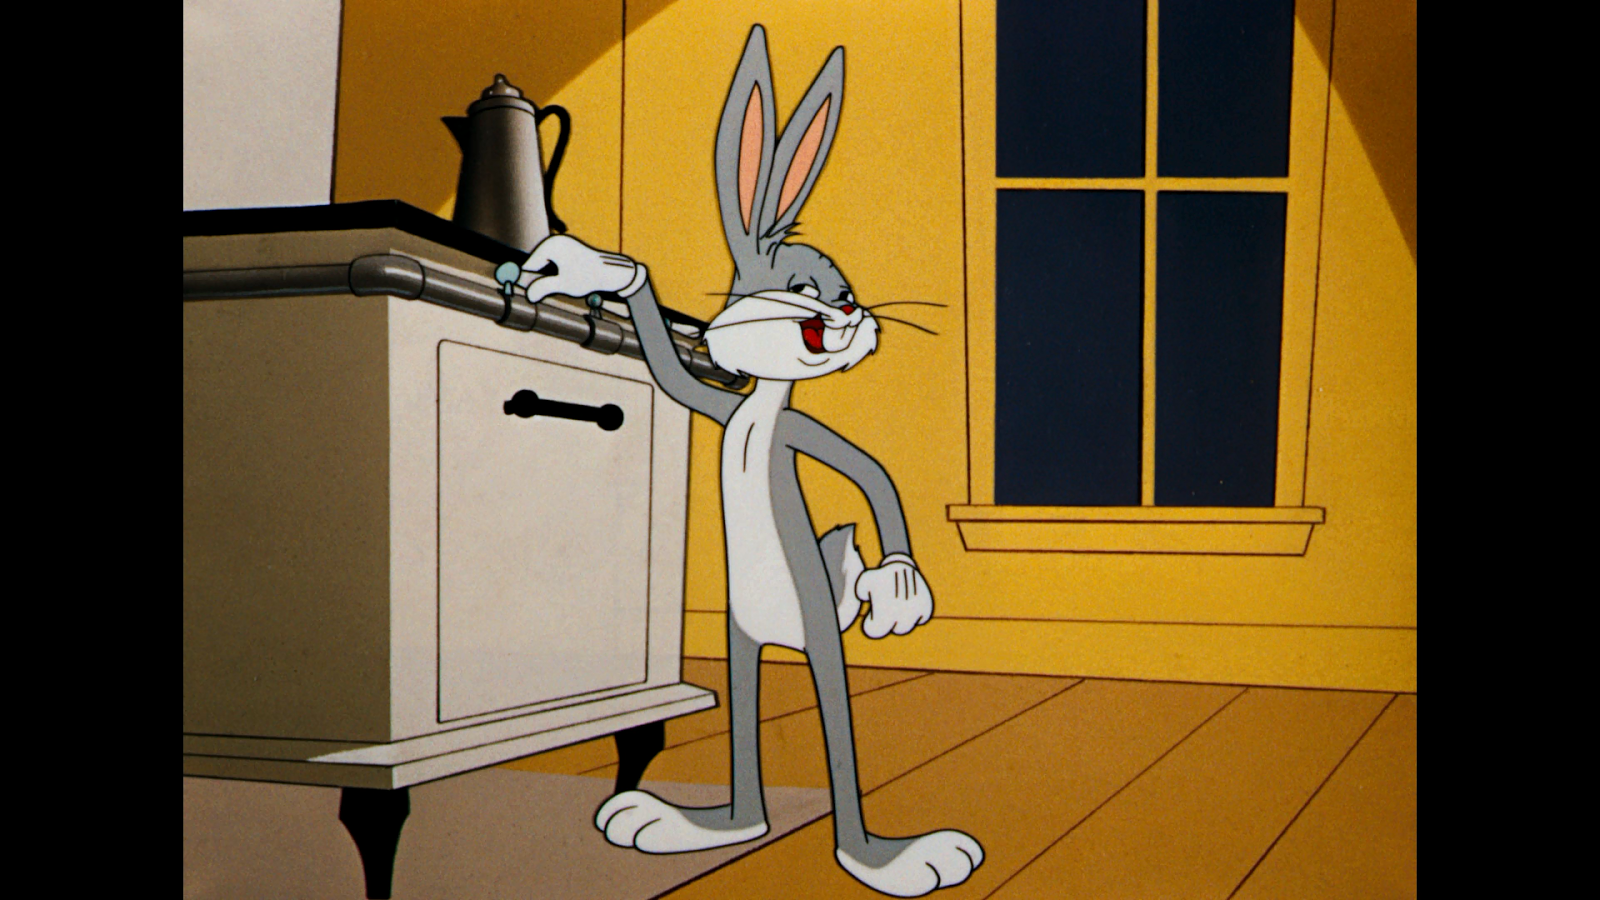 Looney Tunes Platinum Collection (1936-1966) 1080p BD25 5